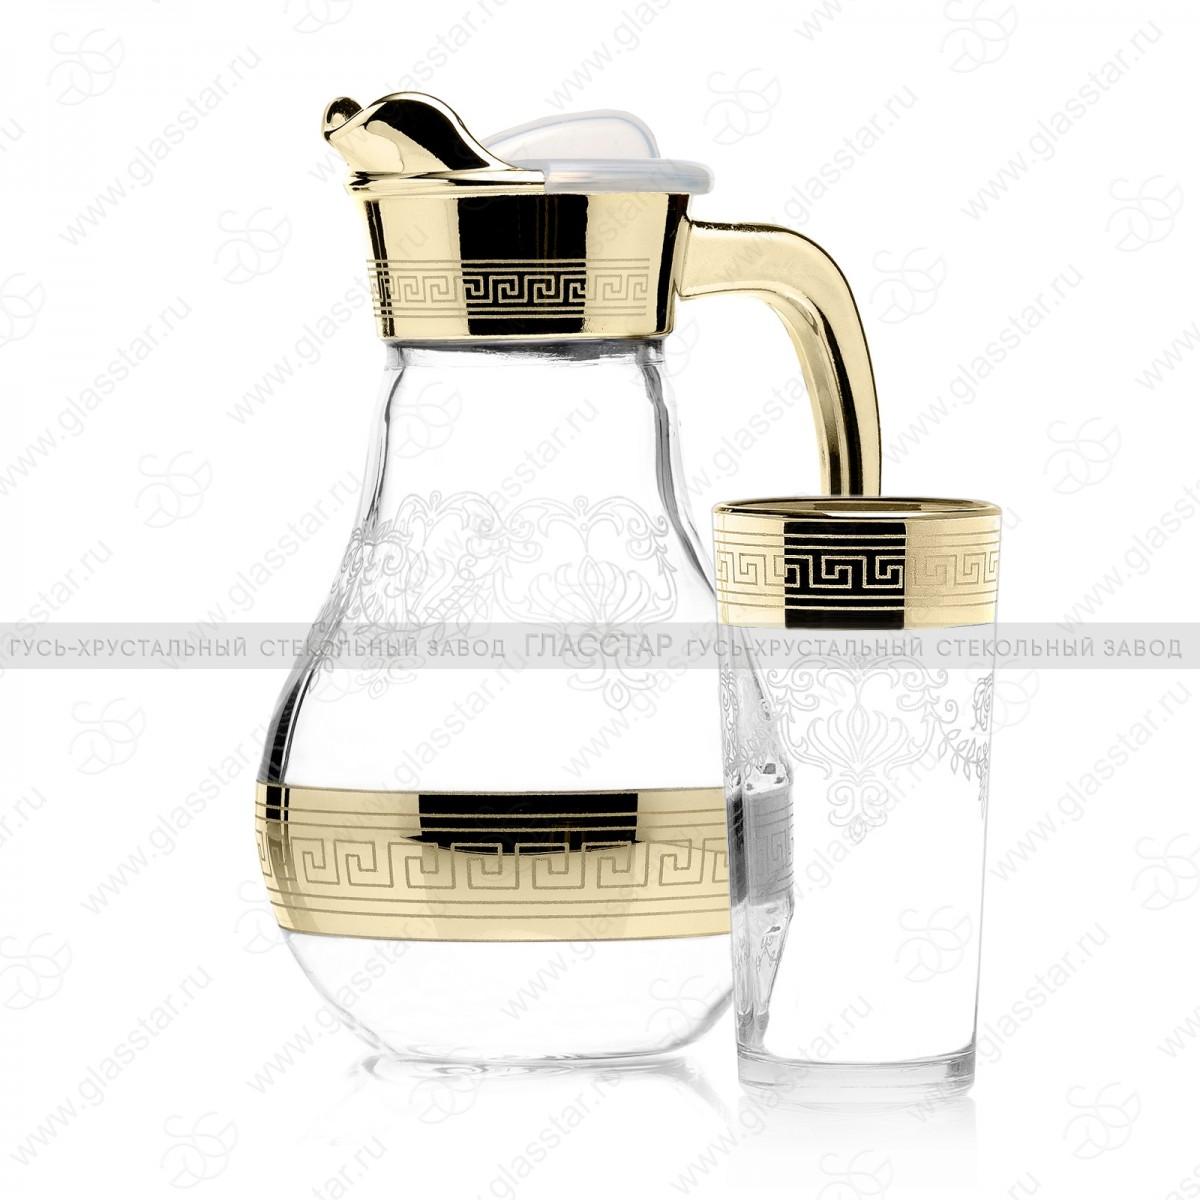 GN1_944_56(6) Набор 7 предмета «Барокко»  (Кувшин + 6 стаканов)